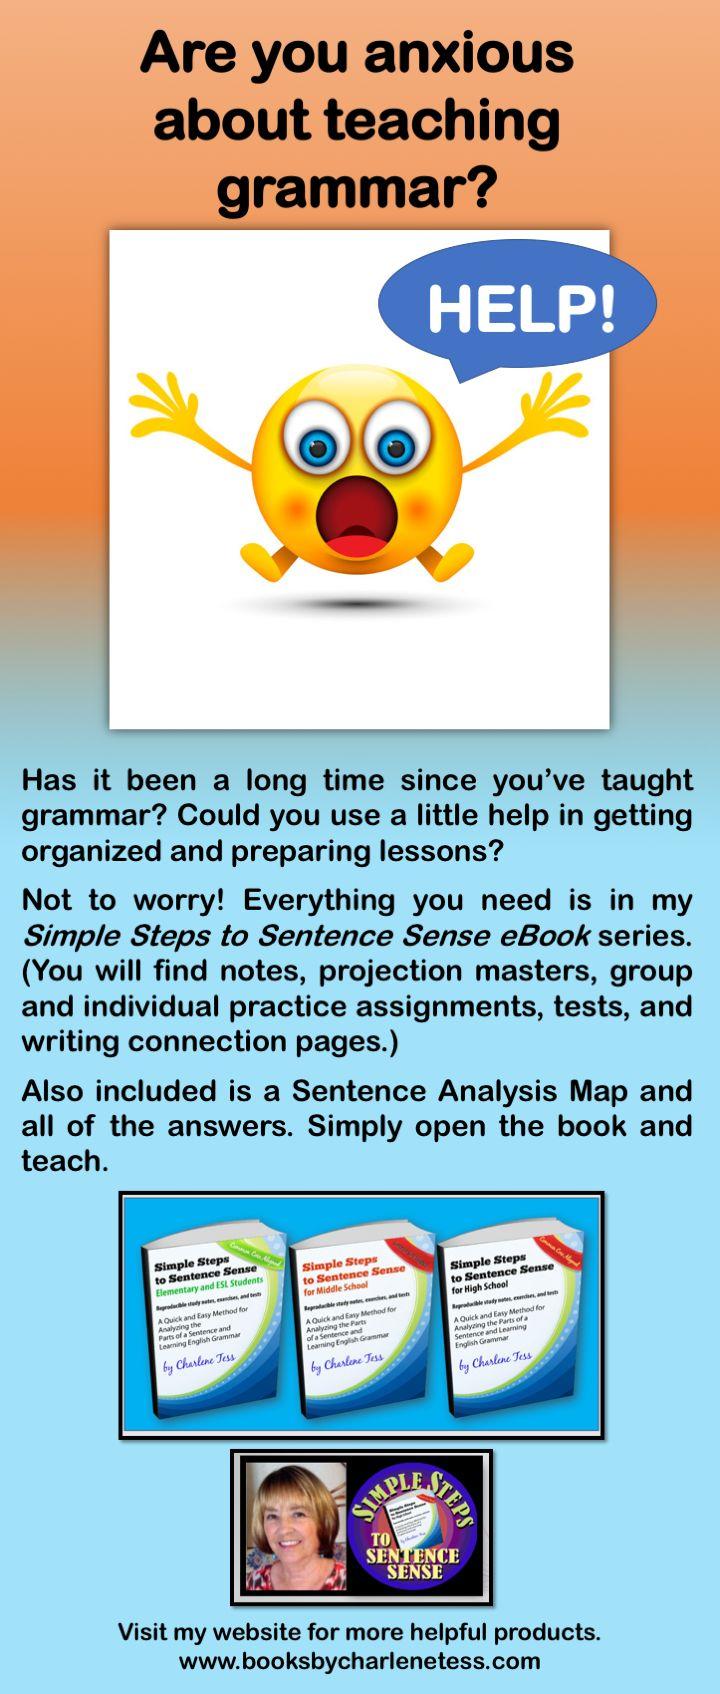 Teach #grammar the easy way with #SimpleStepstoSentenceSense #teaching grammar high school